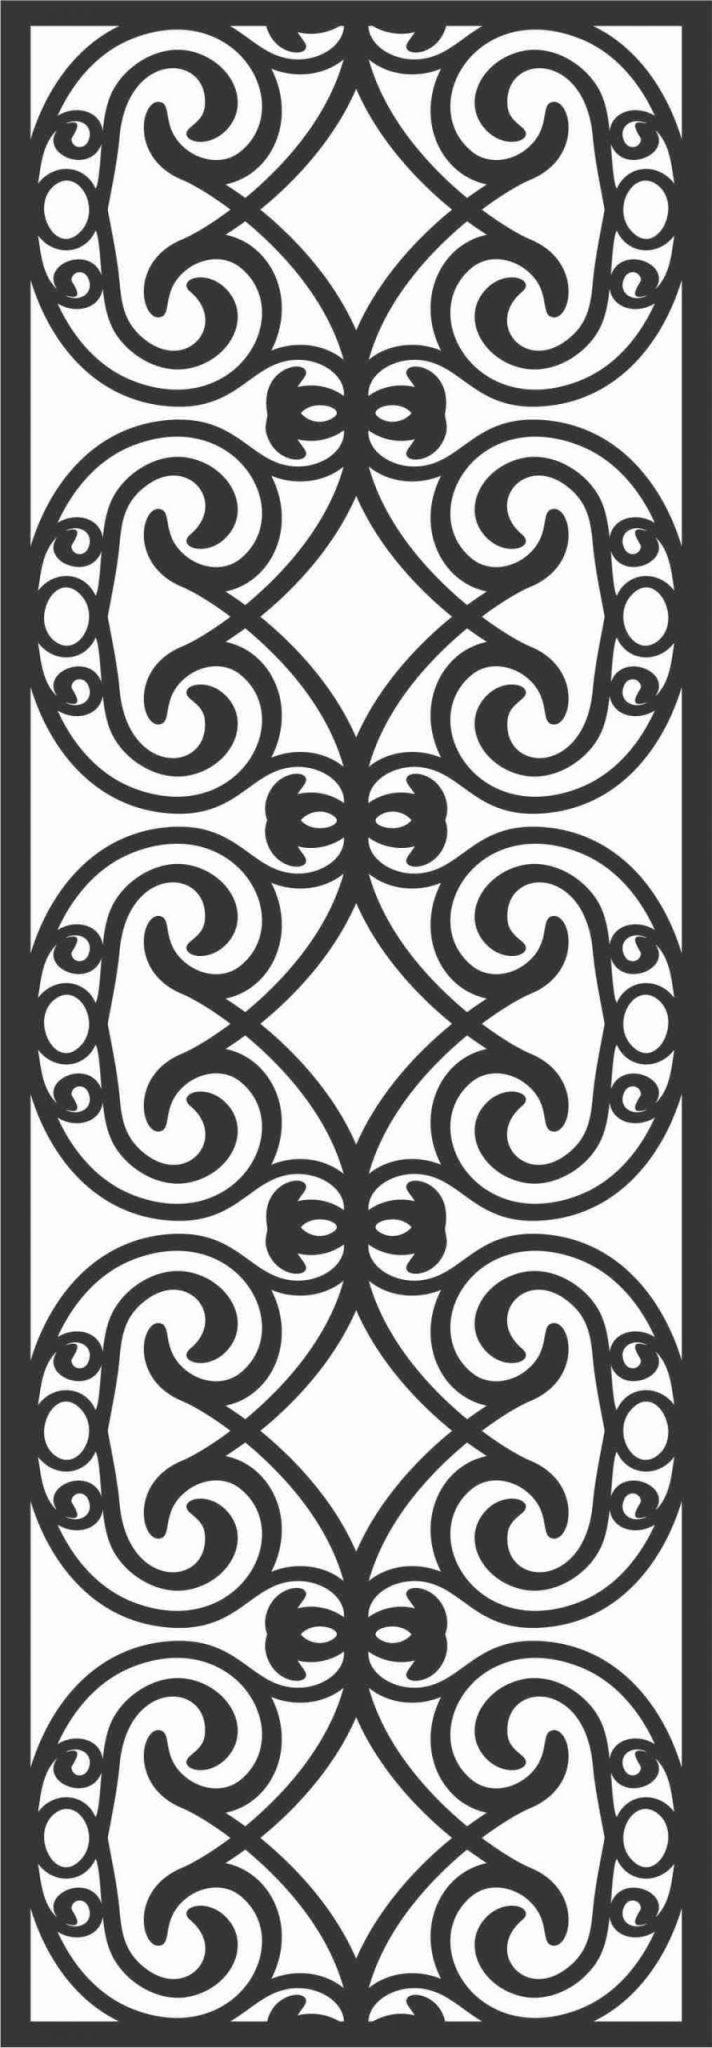 Screen Panel Patterns Seamless 93 Free DXF File